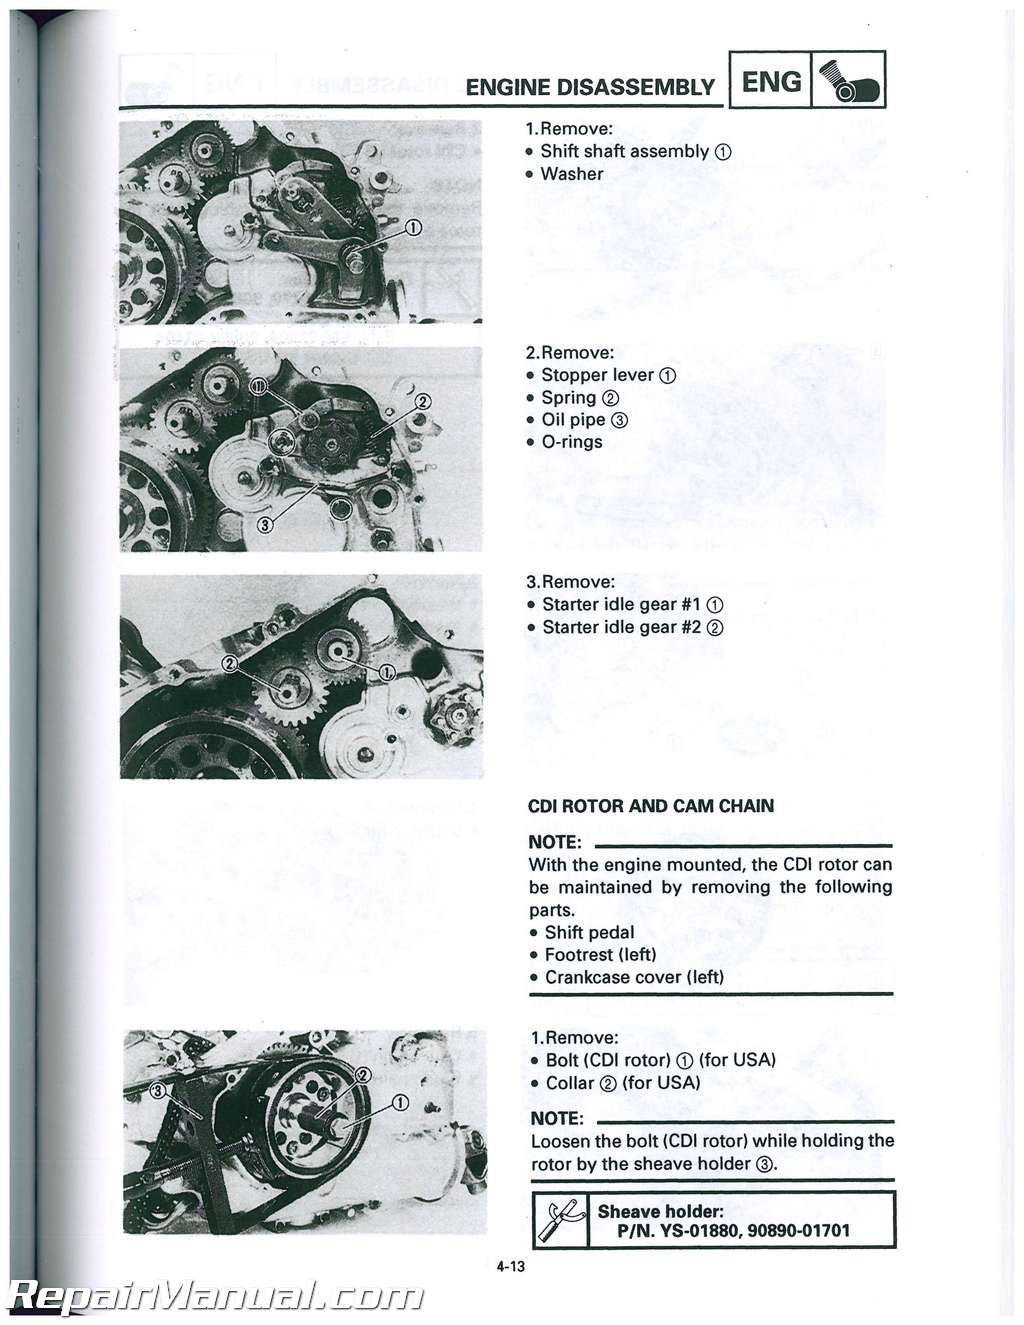 yamaha wolverine 350 service manual